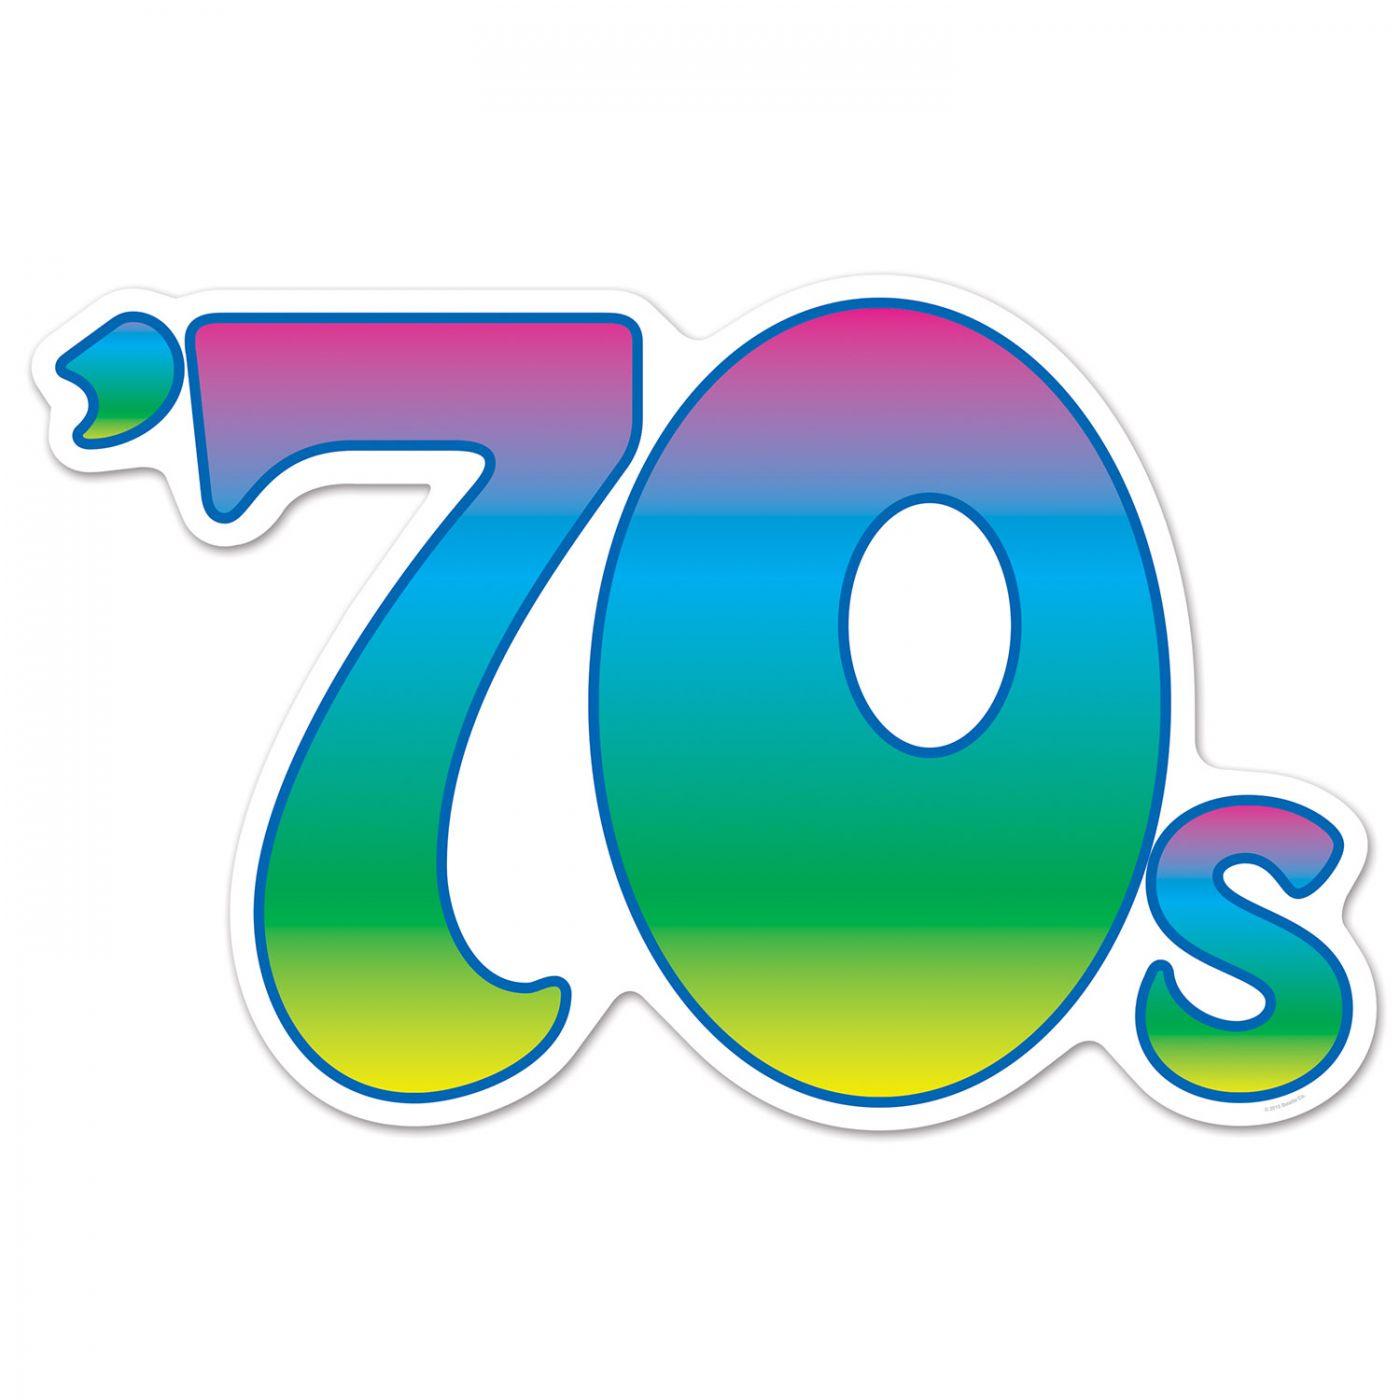 '70's Cutout image